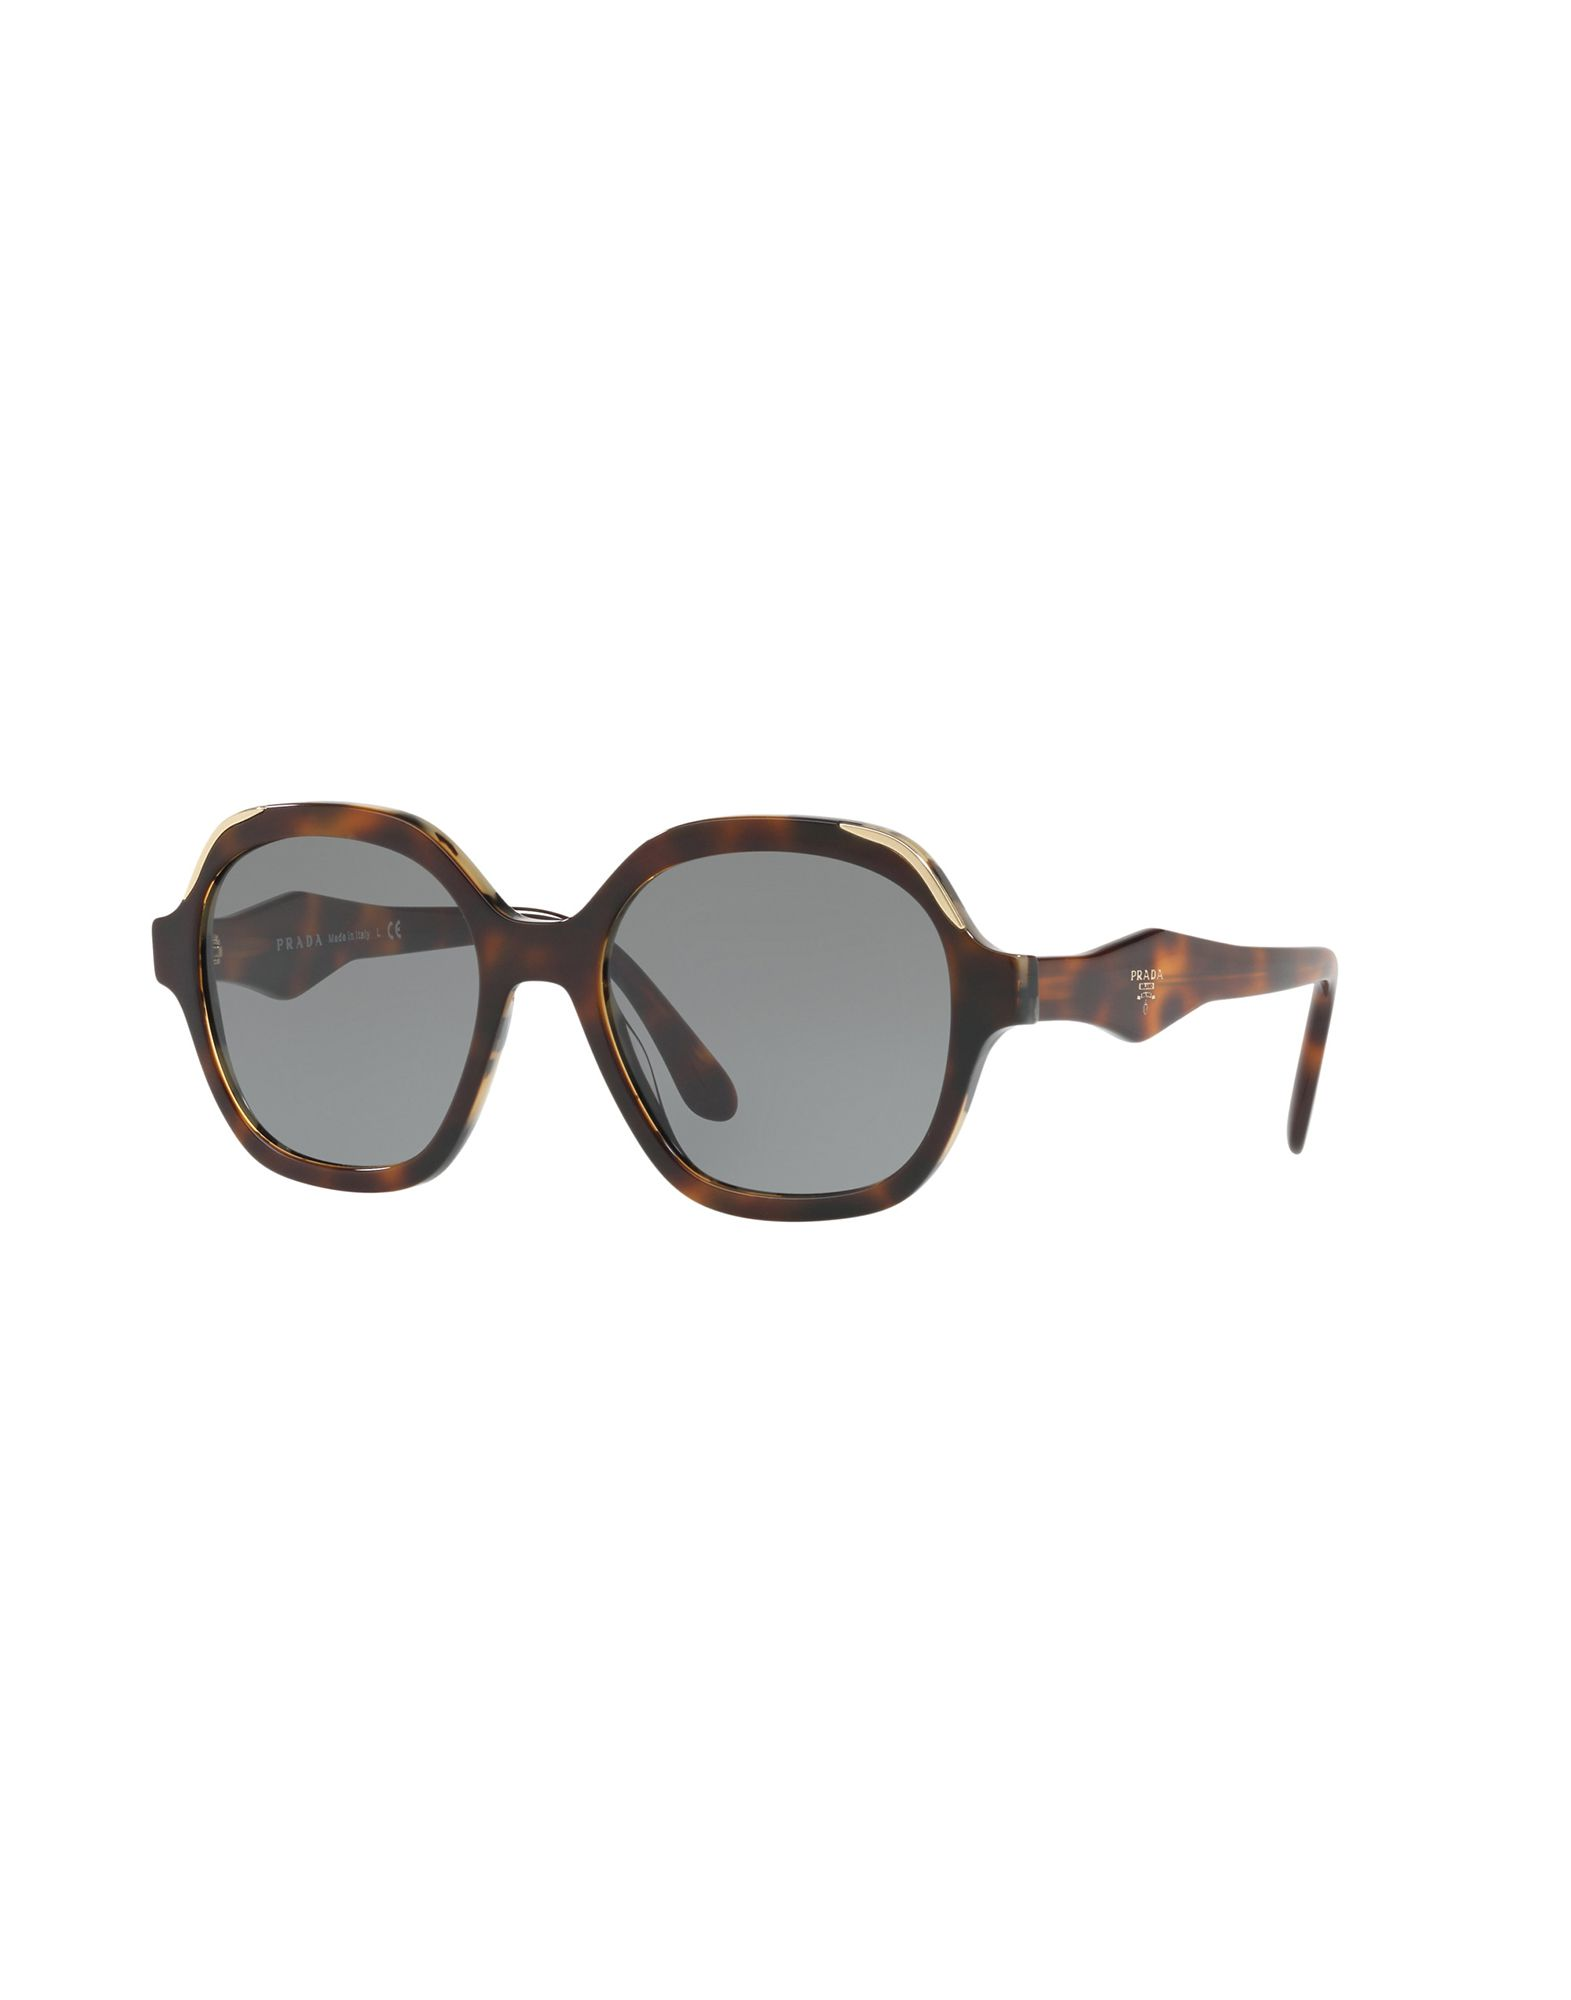 Occhiali Da Sole Prada Pr 06Us - Donna - Acquista online su